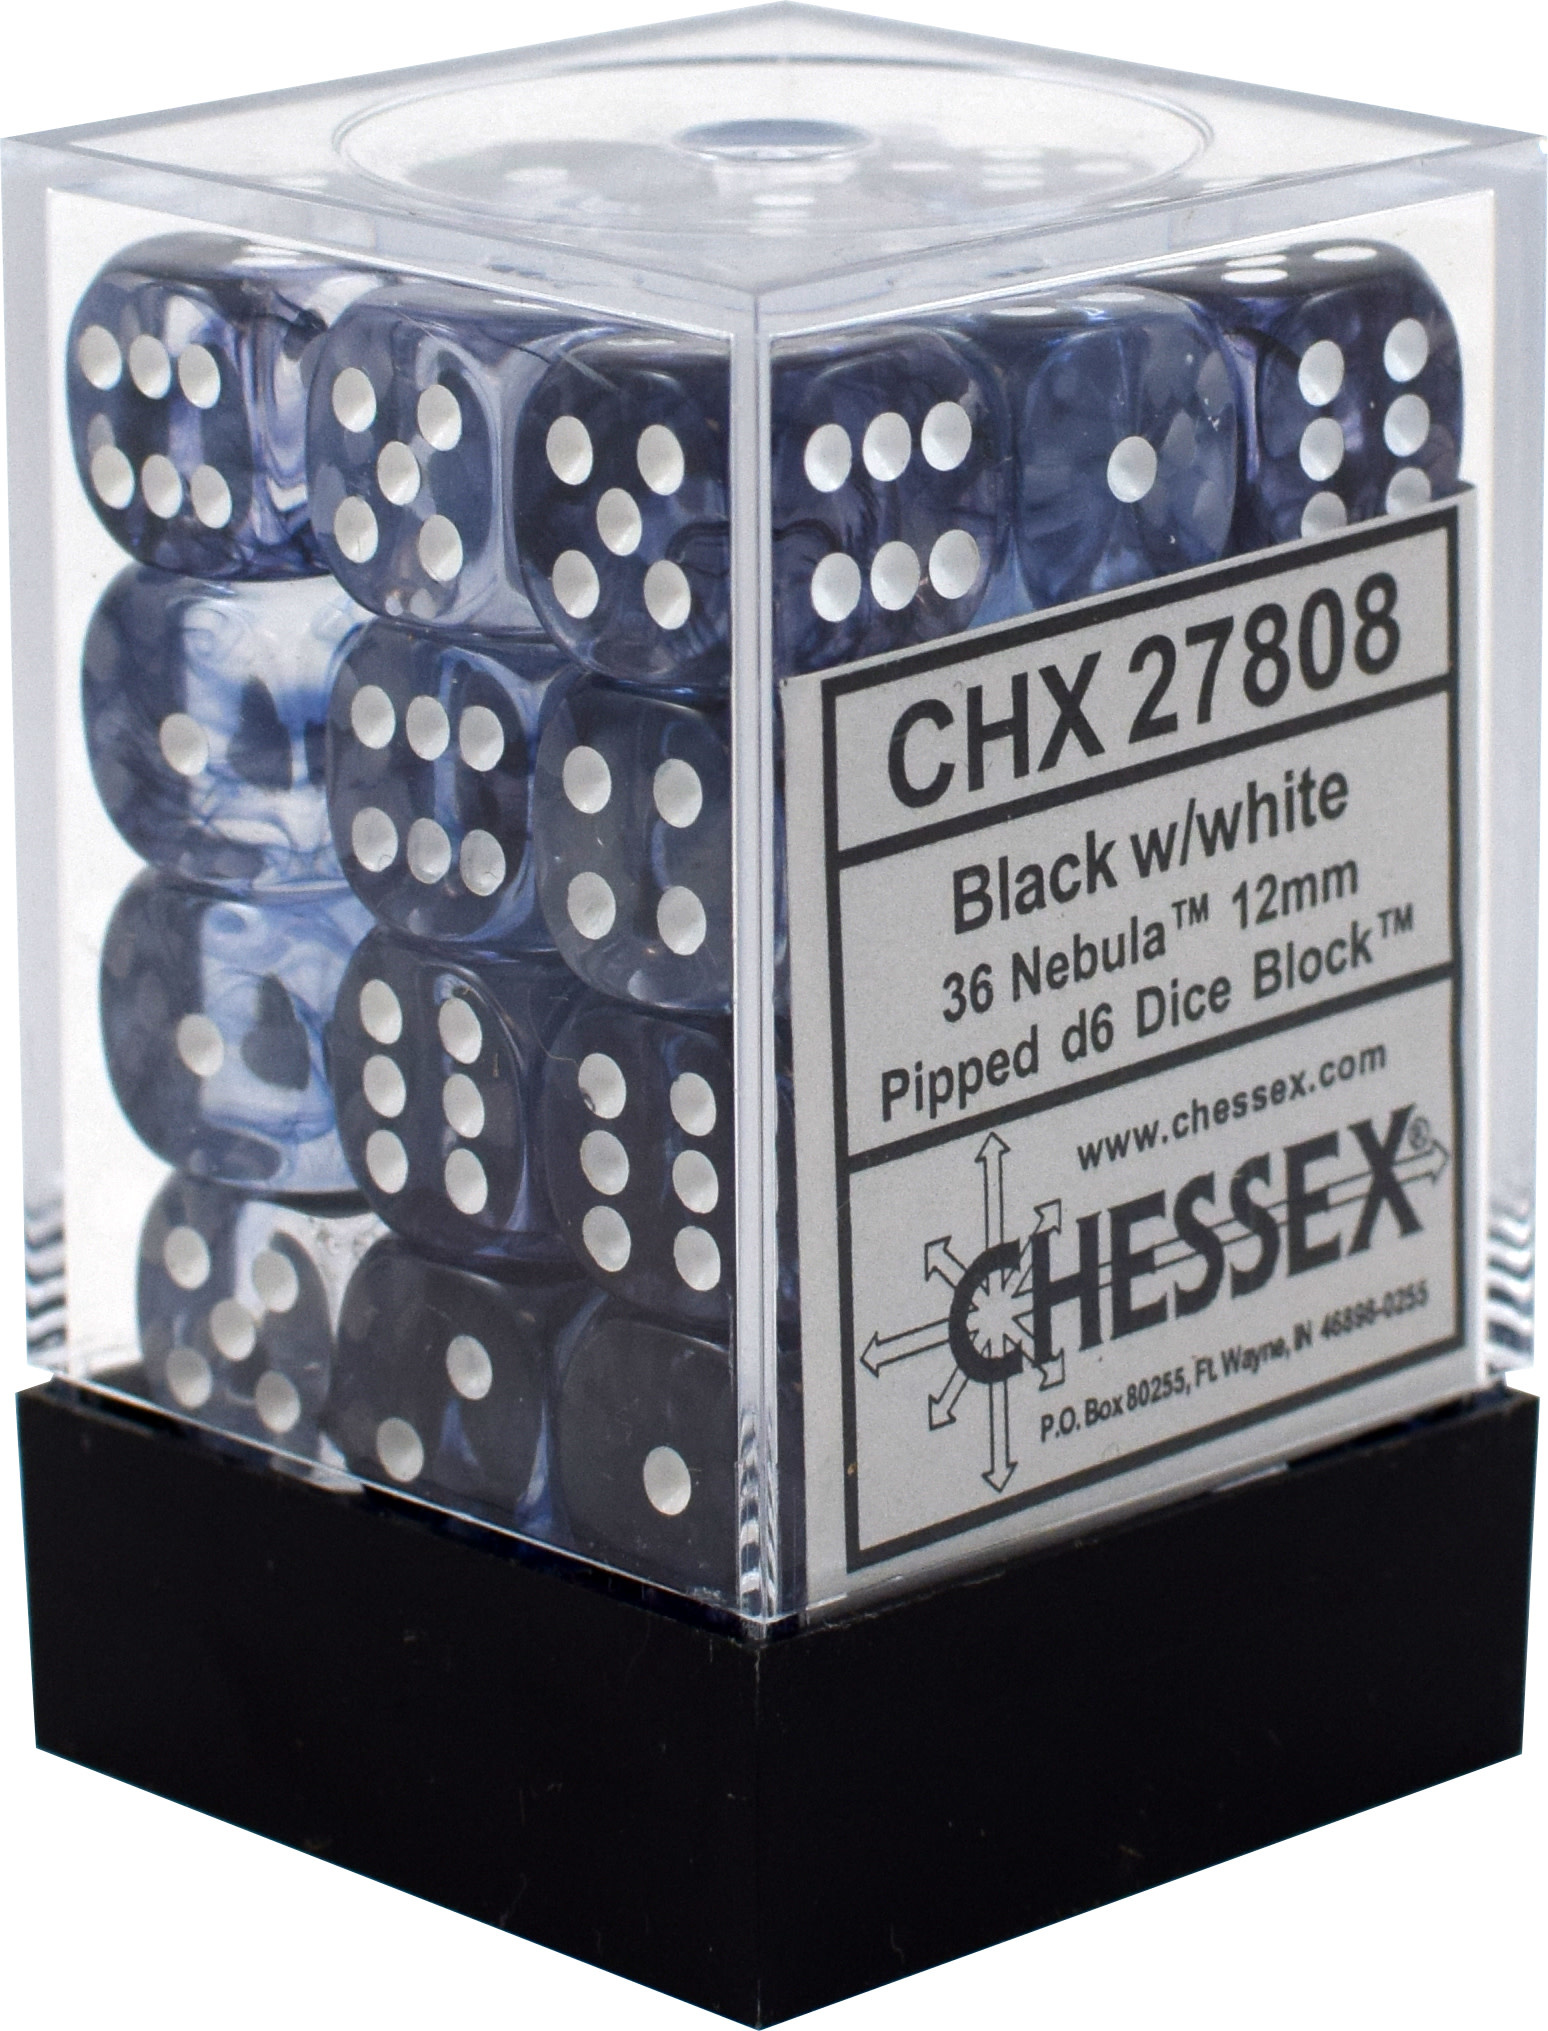 Chessex Chessex Nebula Black/White Set of 36 D6 Dice